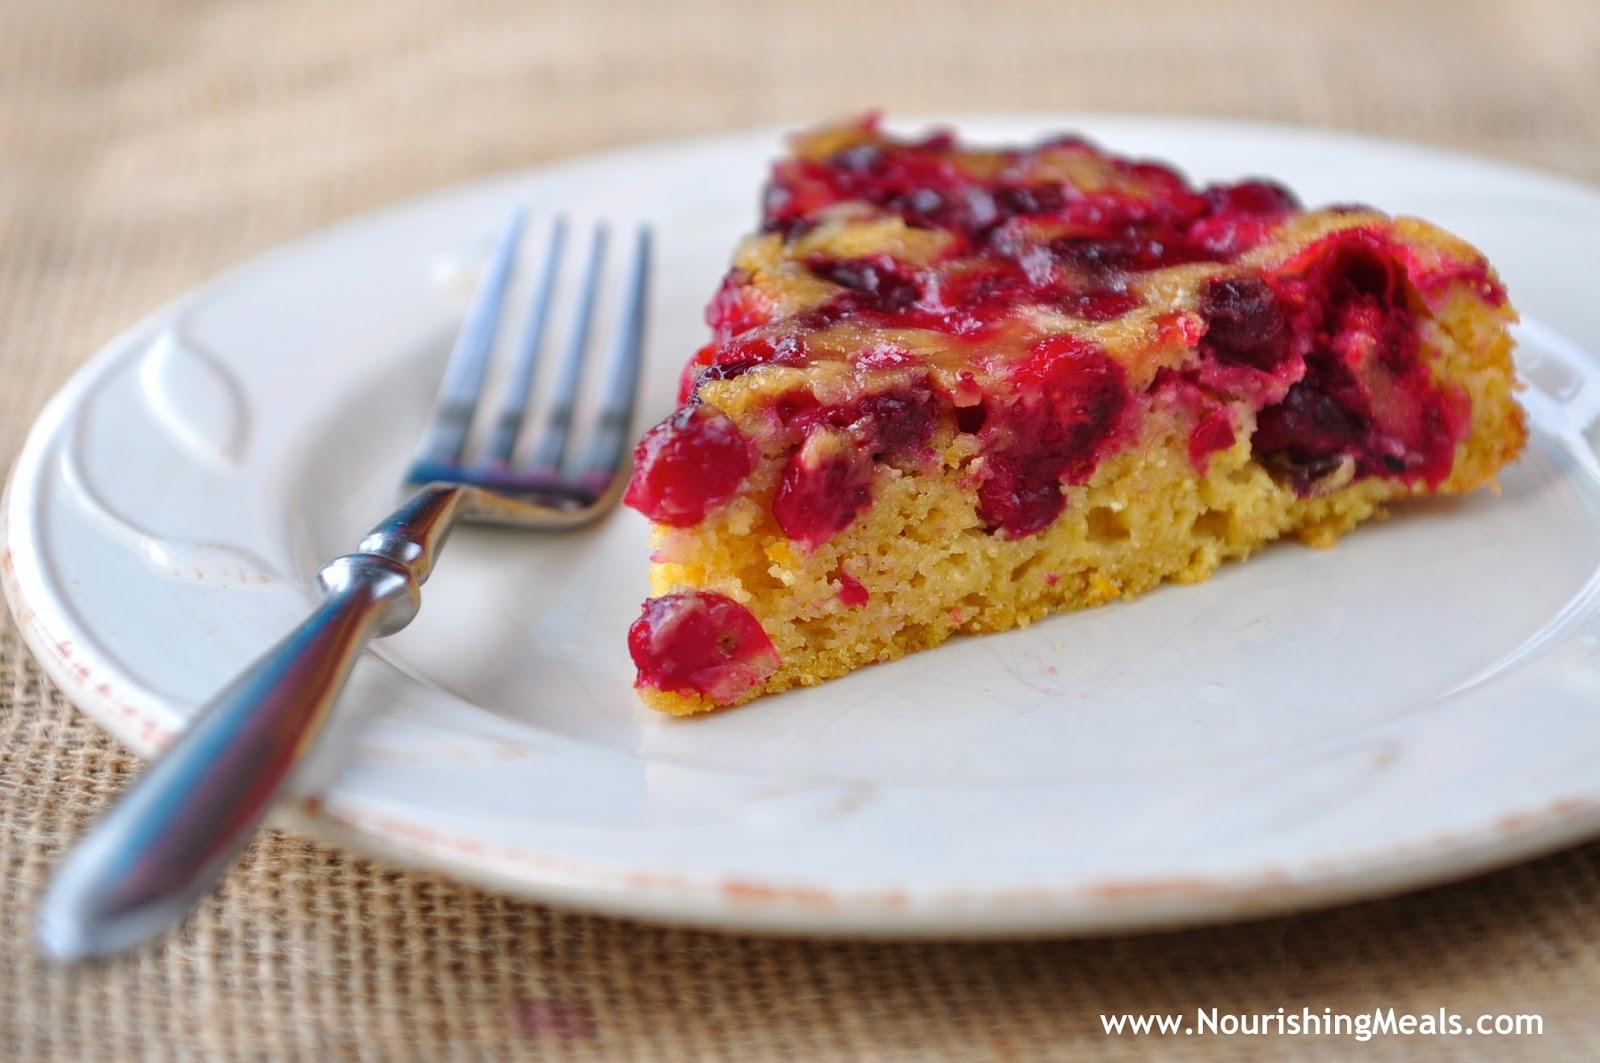 Nourishing Meals: Cranberry Orange Upside Down Cake (grain-free)